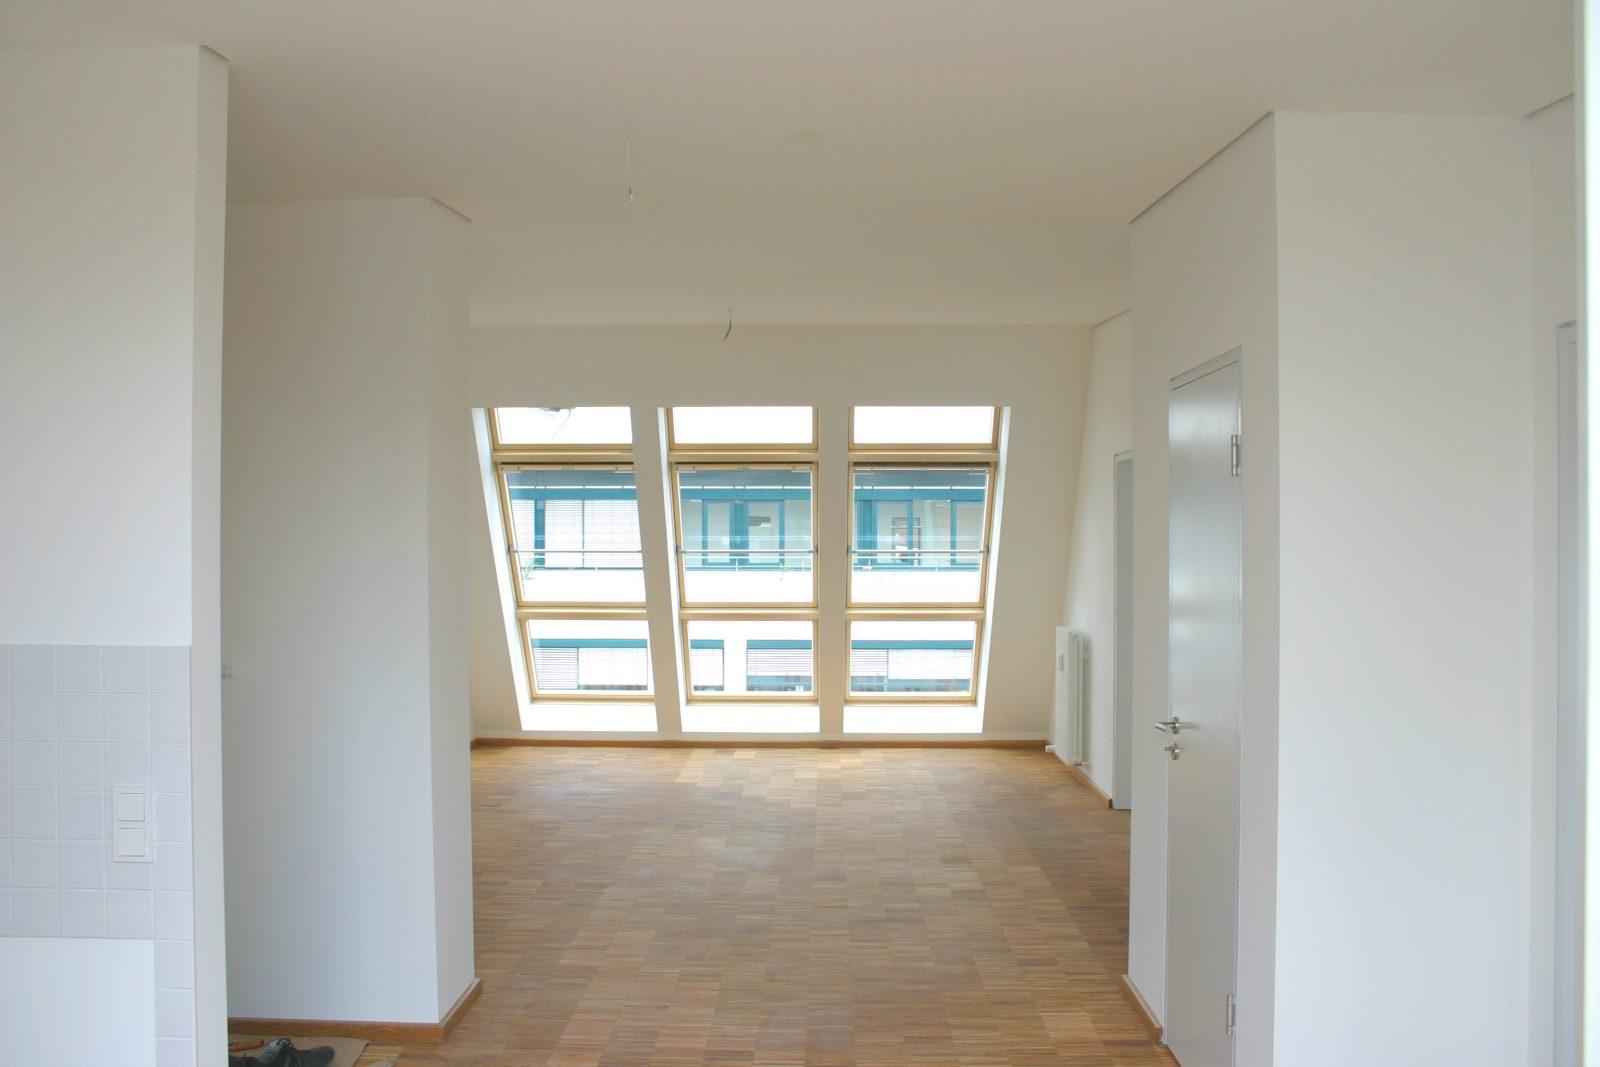 Mehrfamilienhaus Gleimstraße 25, Berlin-Prenzlauer Berg